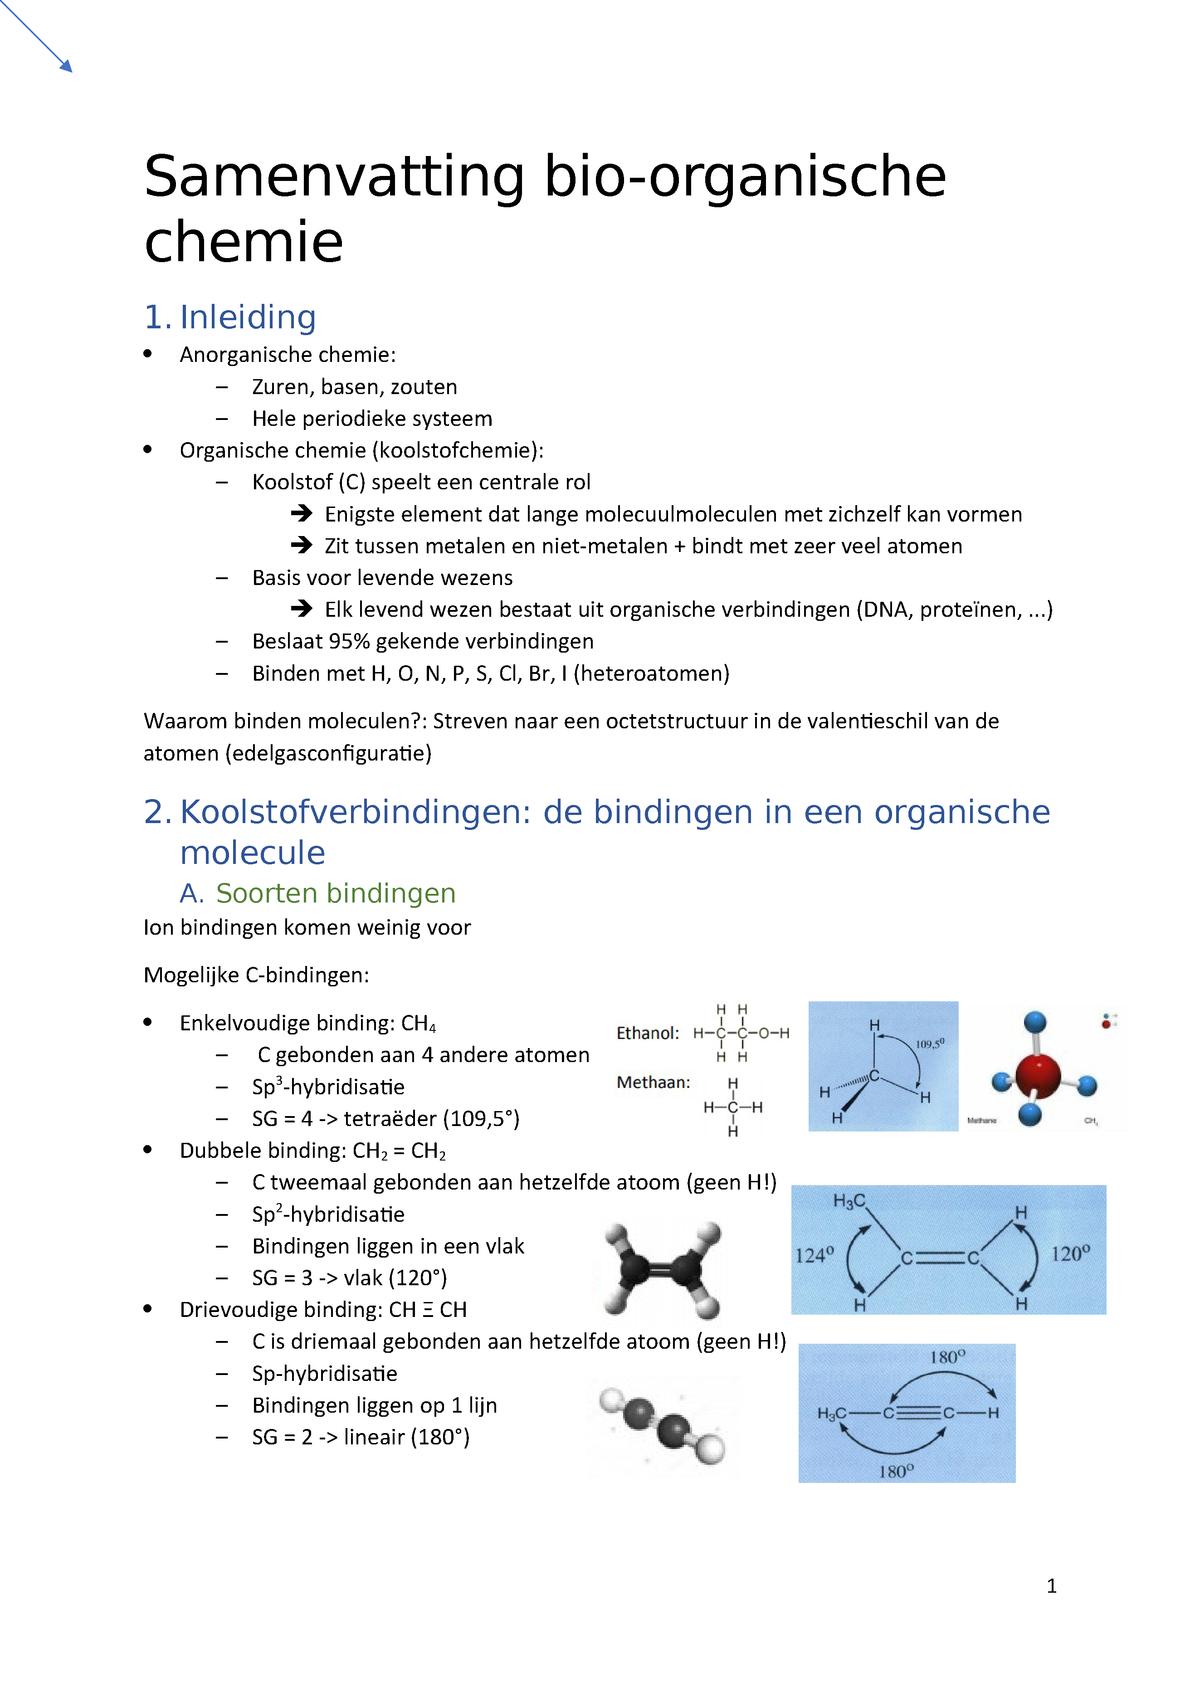 Samenvatting Bio Organische Chemie 1 17 18 Ap Studocu